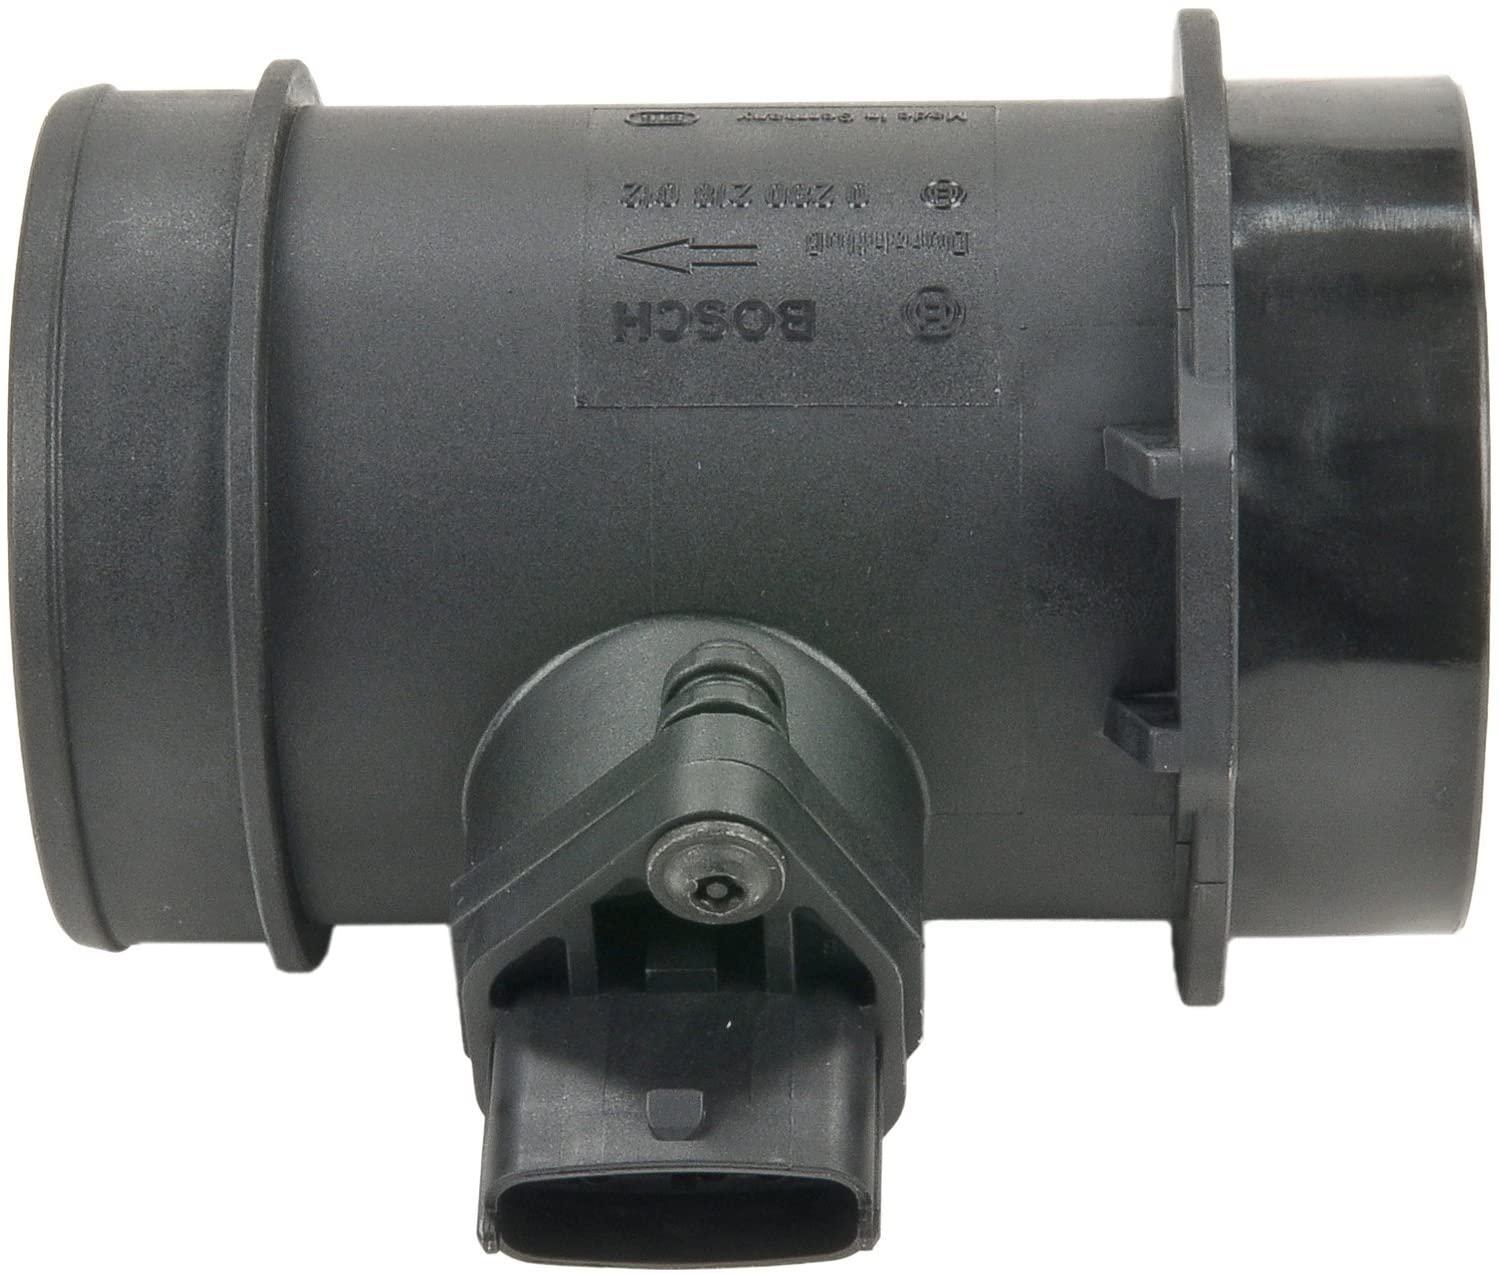 Bosch Automotive 280218084 Original Equipment Mass Air Flow (MAF) Sensor